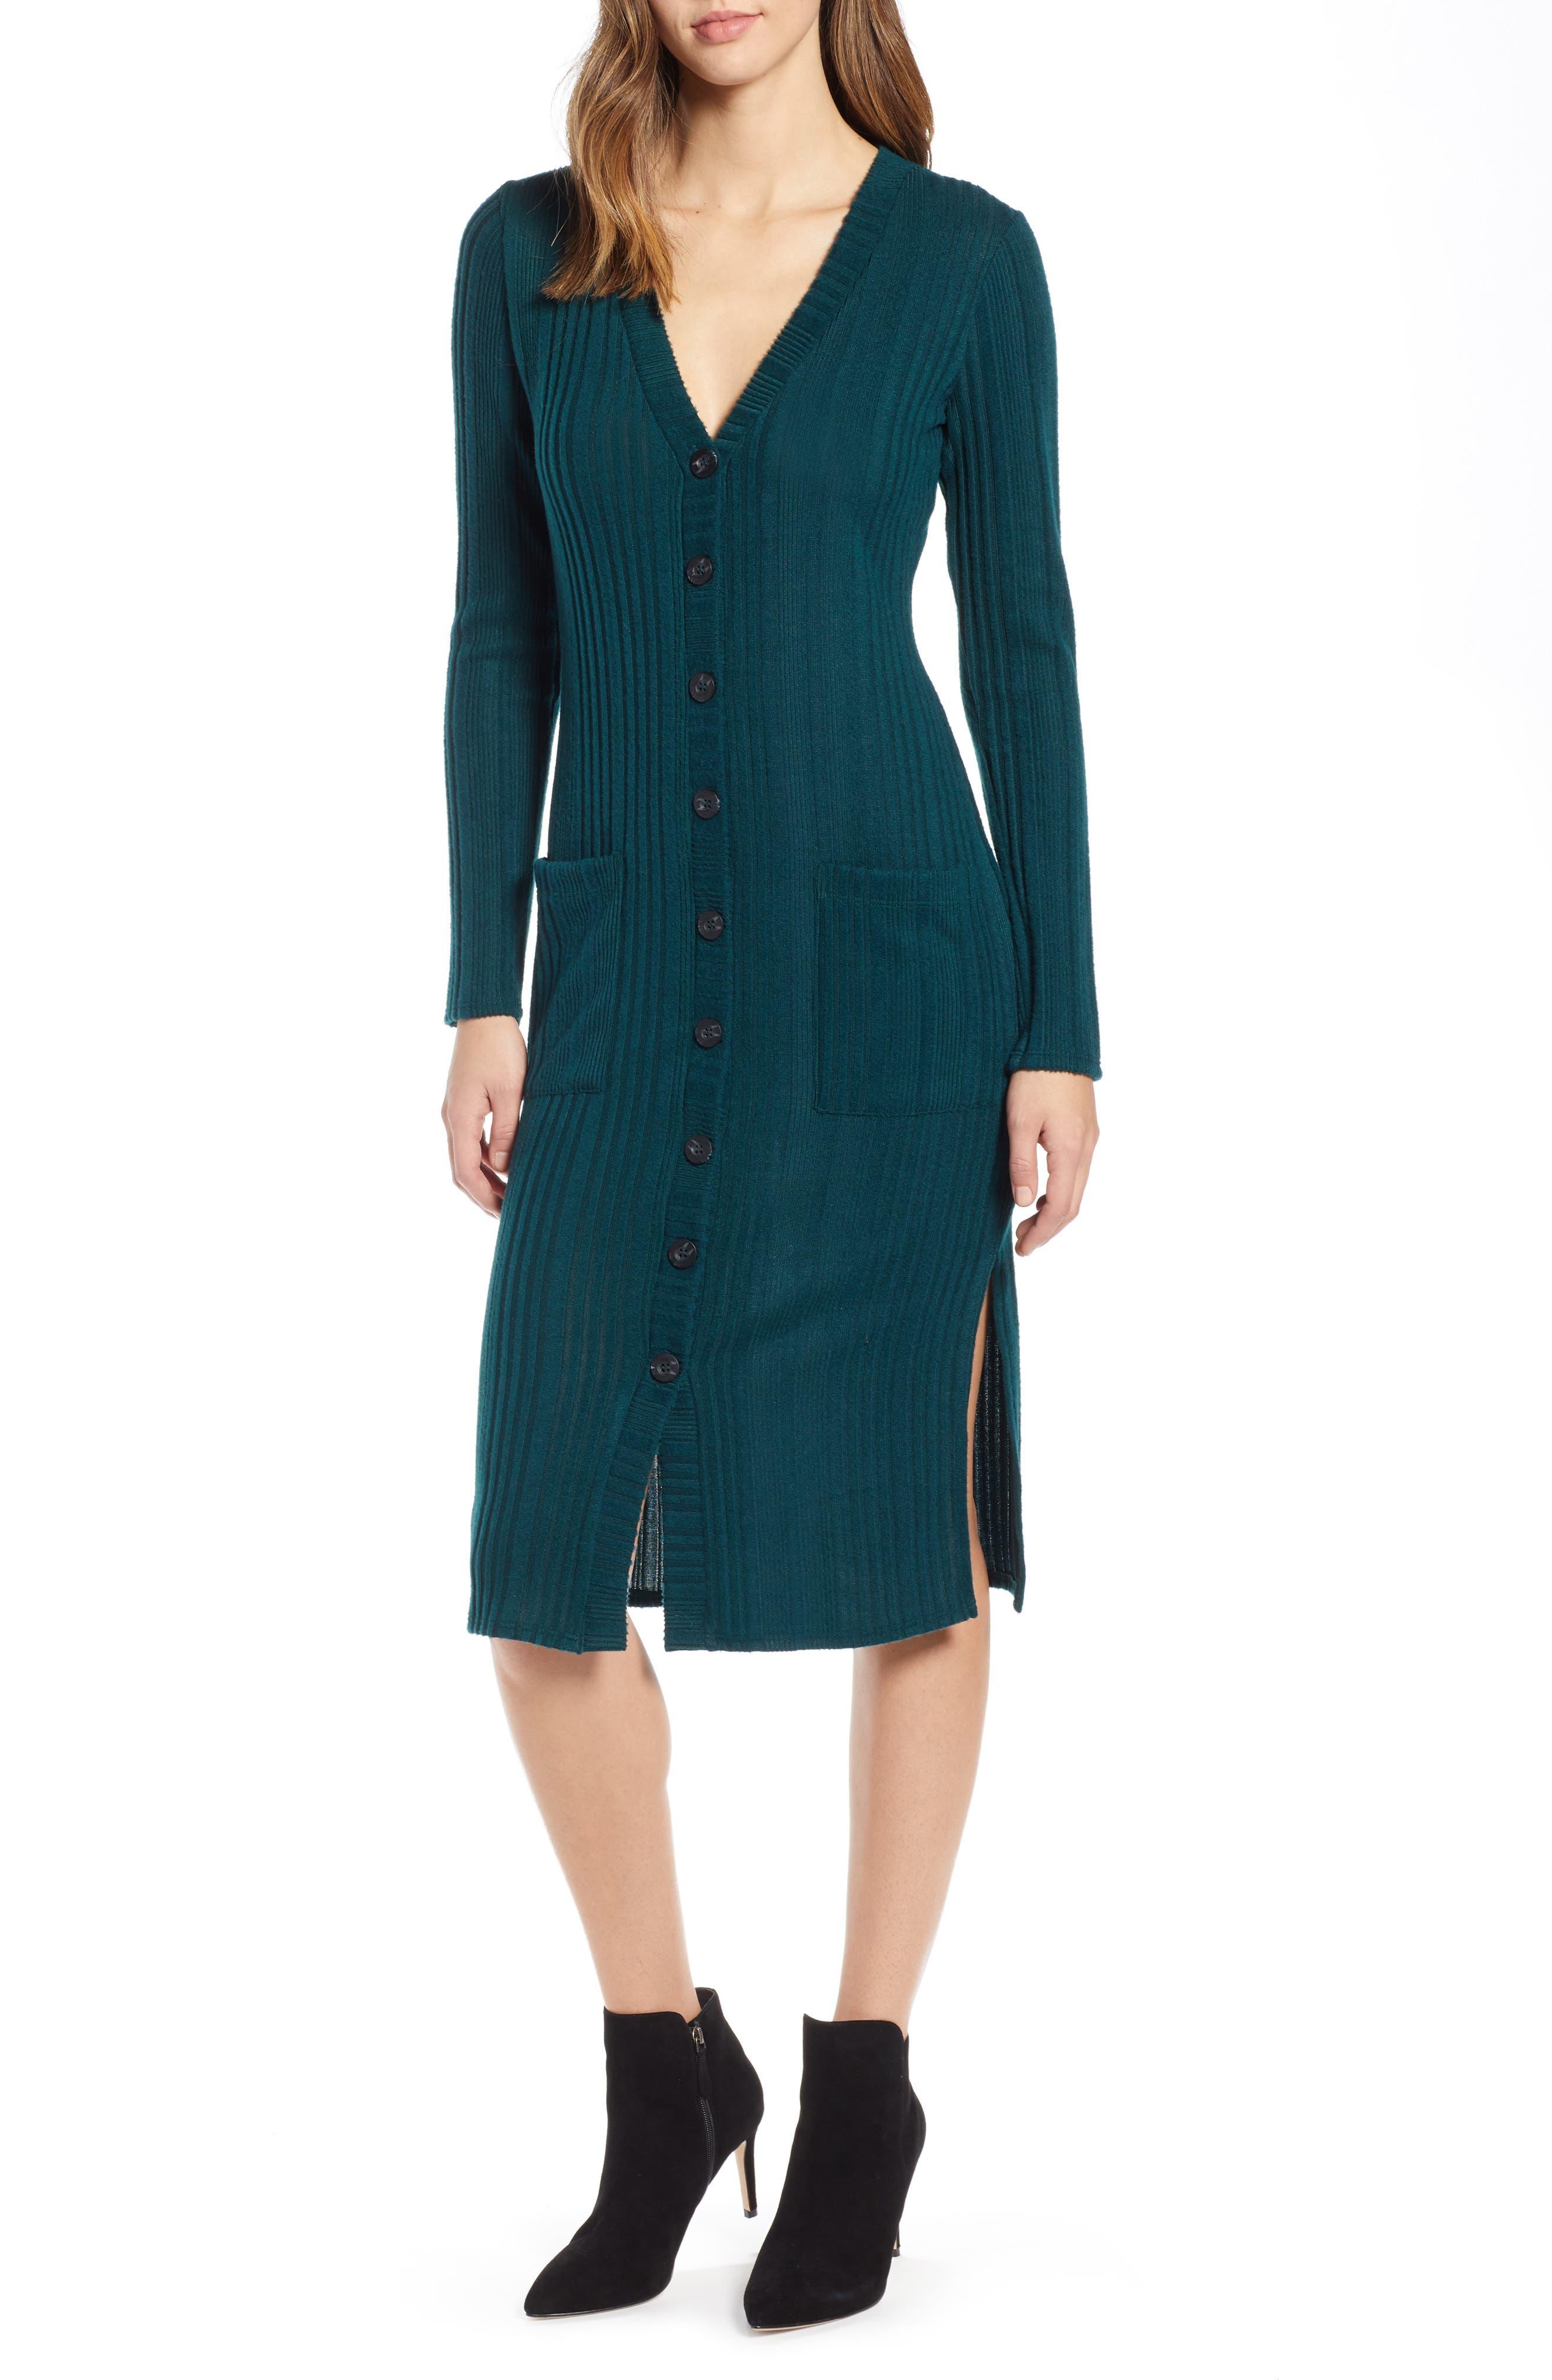 SOCIALITE,                             Sweater Dress,                             Alternate thumbnail 6, color,                             300